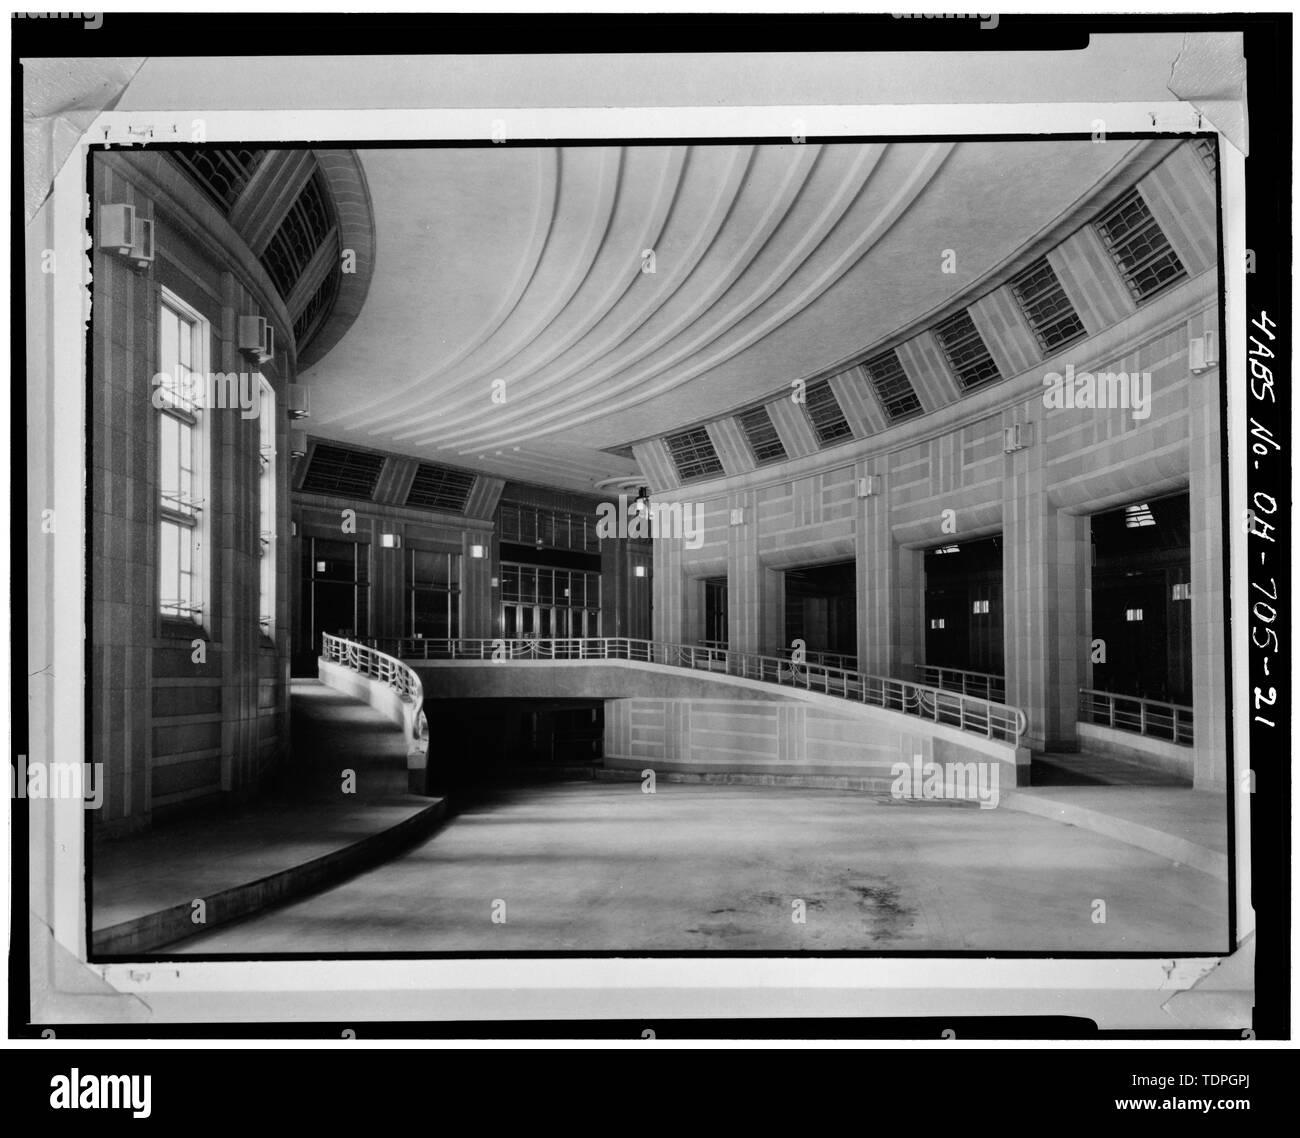 TAXI ENTRANCE (NORTH) RAMP, LOOKING SOUTH - Cincinnati Union Terminal, 1301 Western Avenue, Cincinnati, Hamilton County, OH Stock Photo